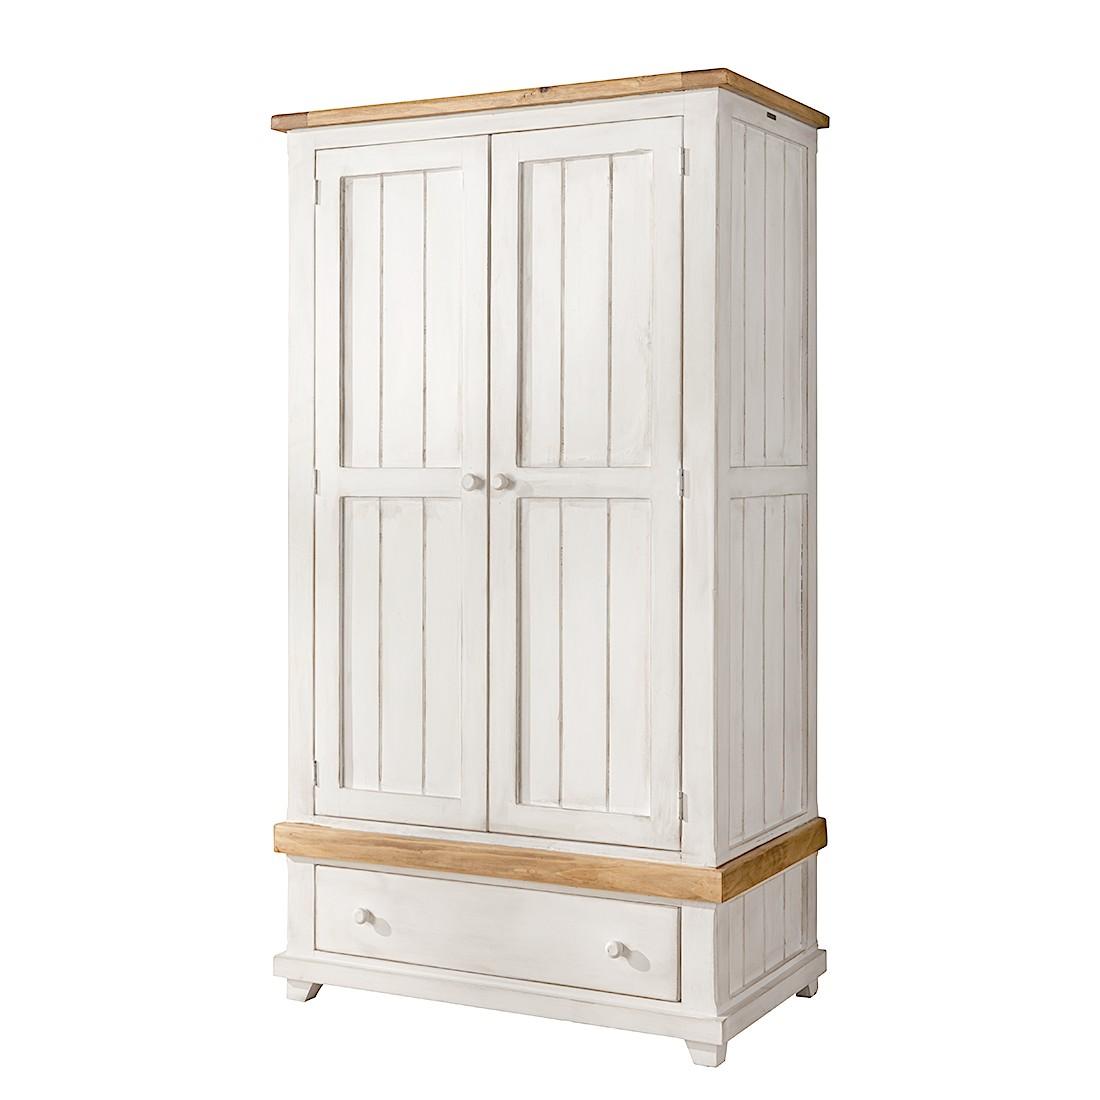 vitrinen schr nke archives. Black Bedroom Furniture Sets. Home Design Ideas